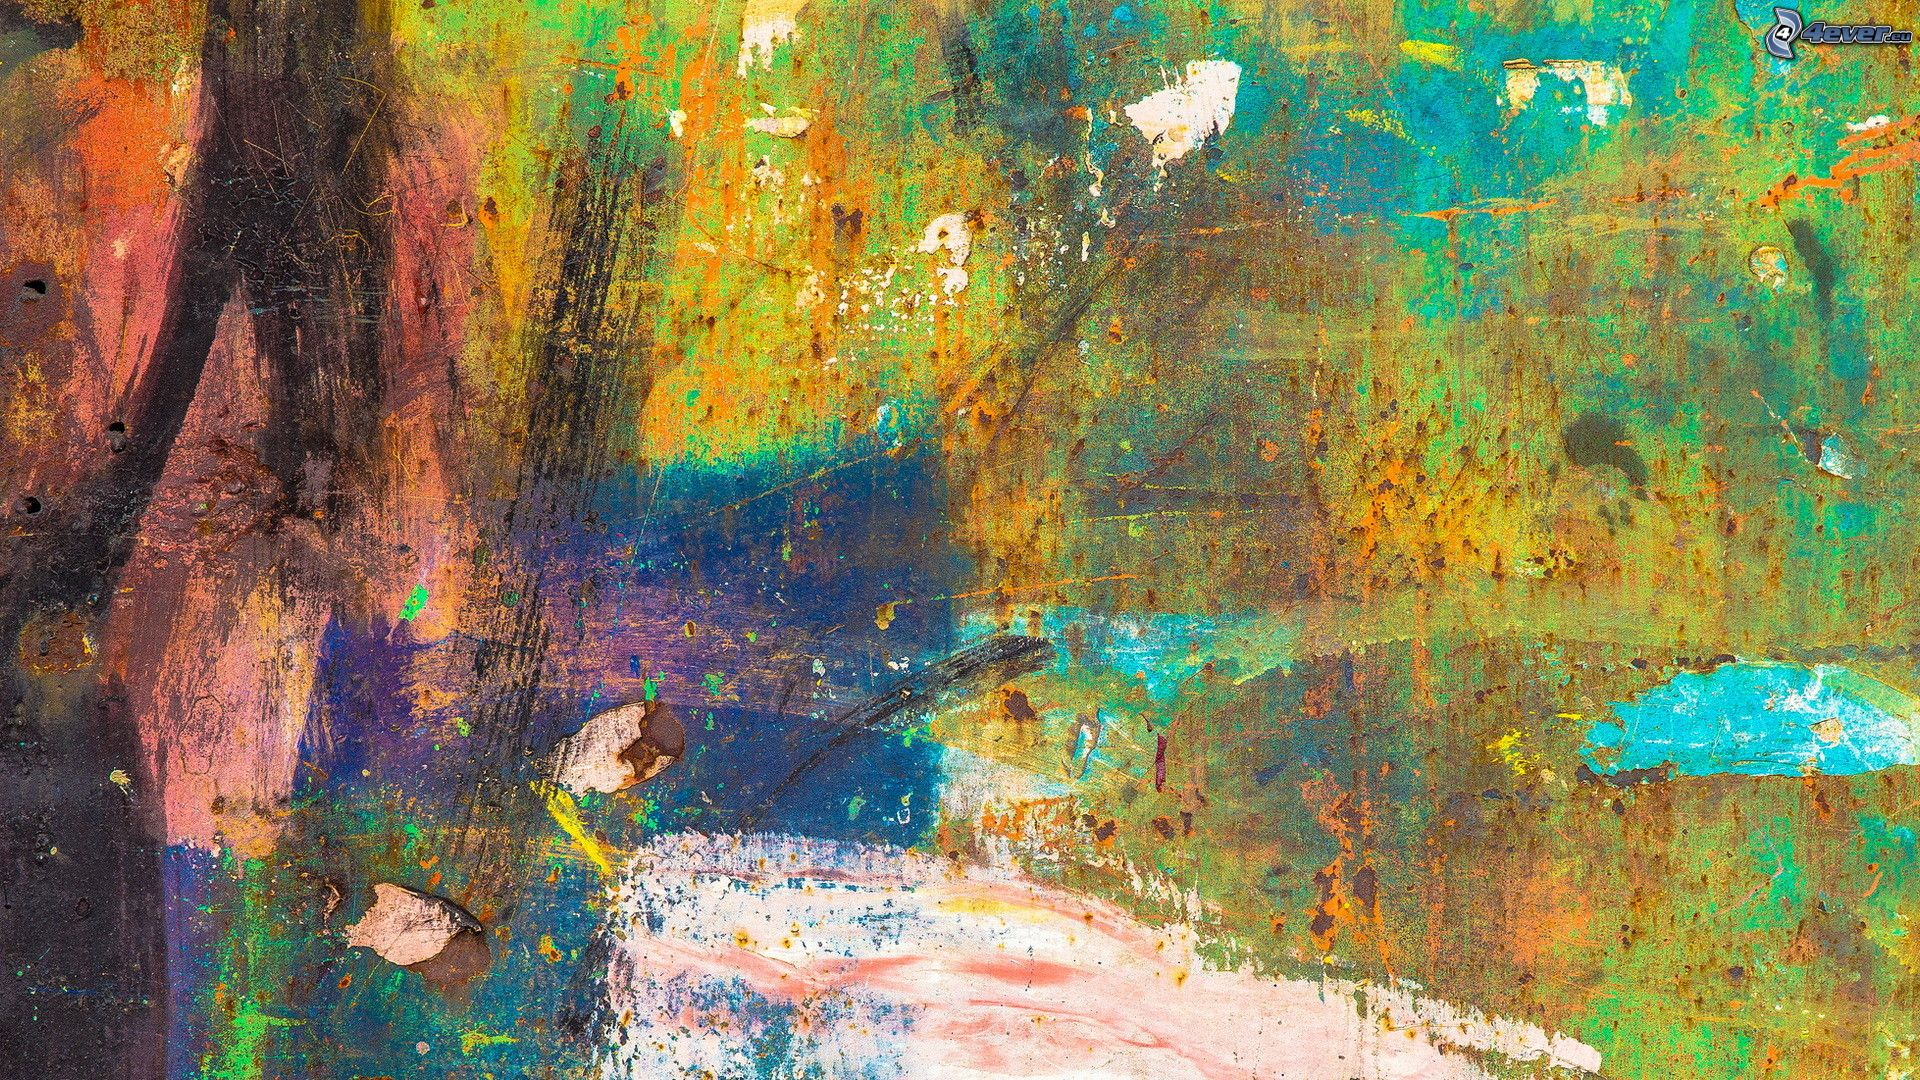 Pintura abstracta for Imagenes de cuadros abstractos faciles